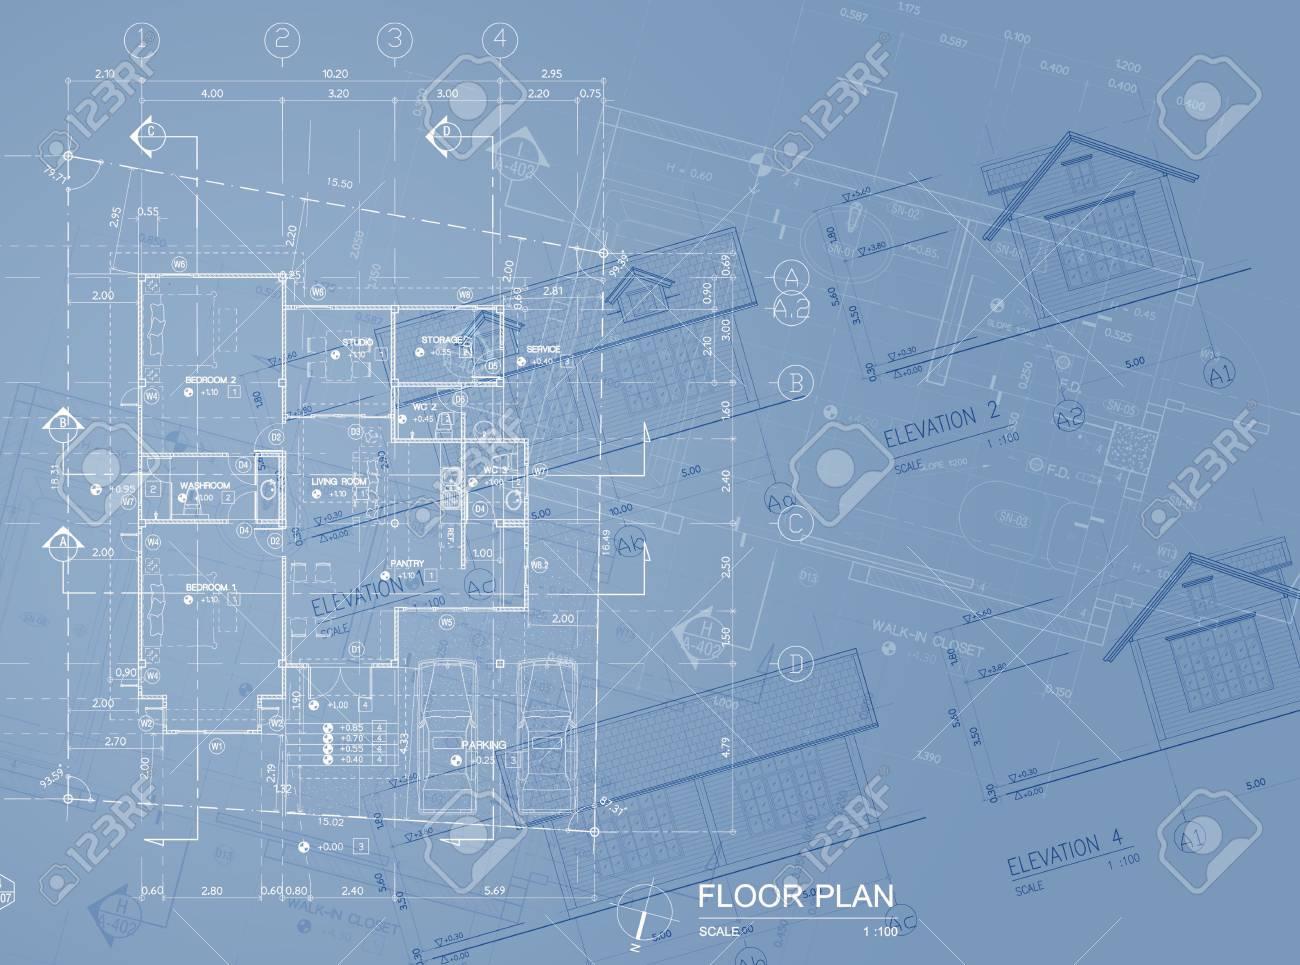 Overlay Of House Blueprint Floor Plan, Elevations And Washroom ...